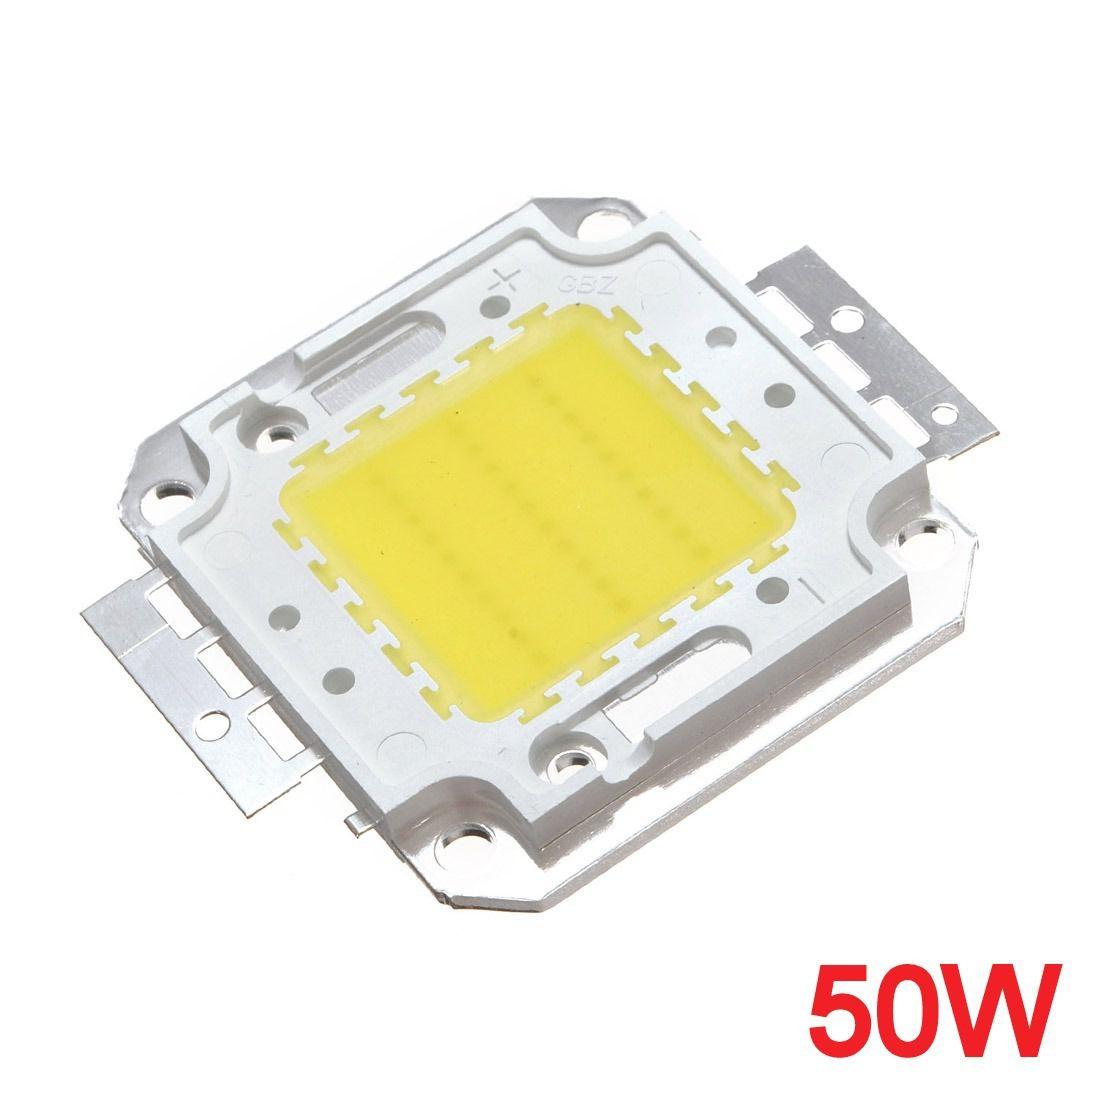 Chip Led 50W - Branco Frio